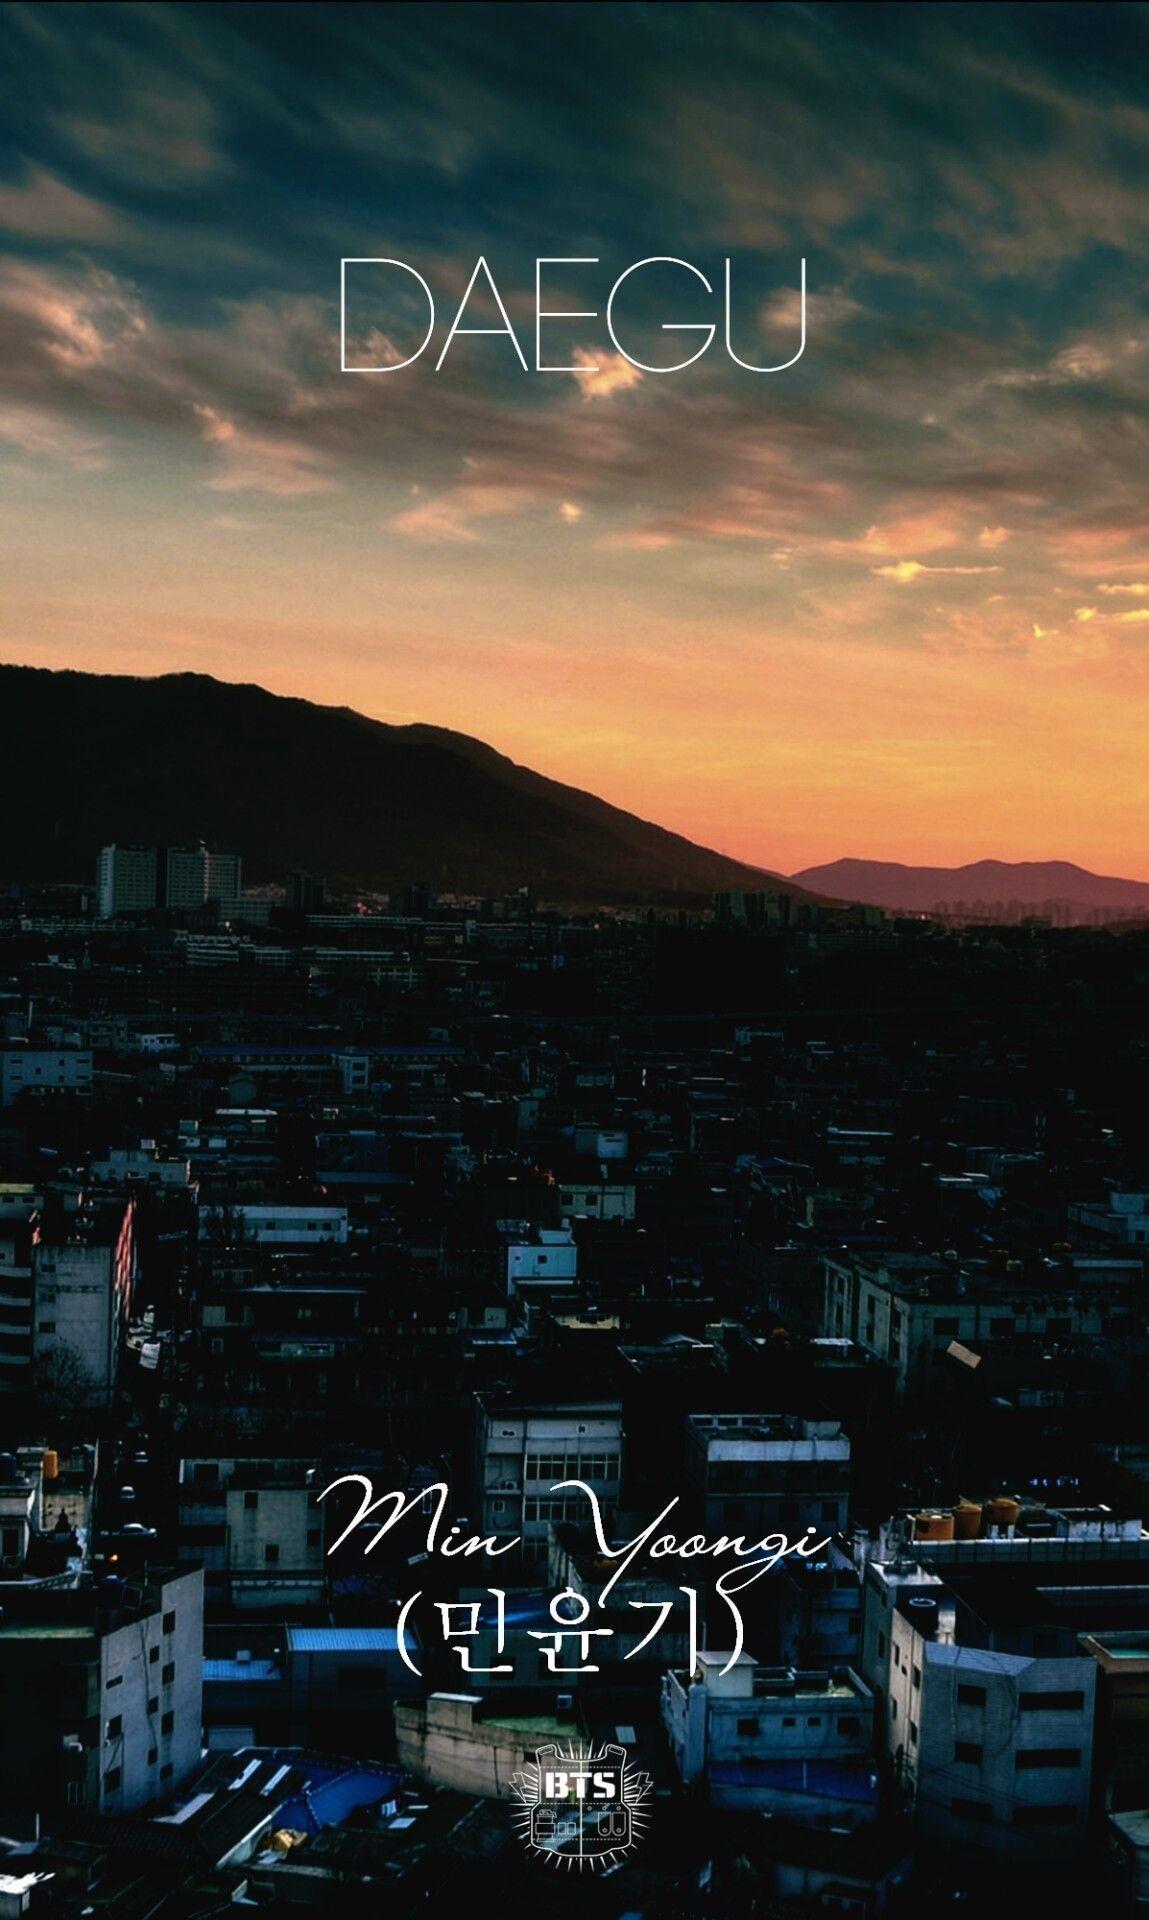 Daegu (With images) Bts wallpaper, Bts lockscreen, Bts